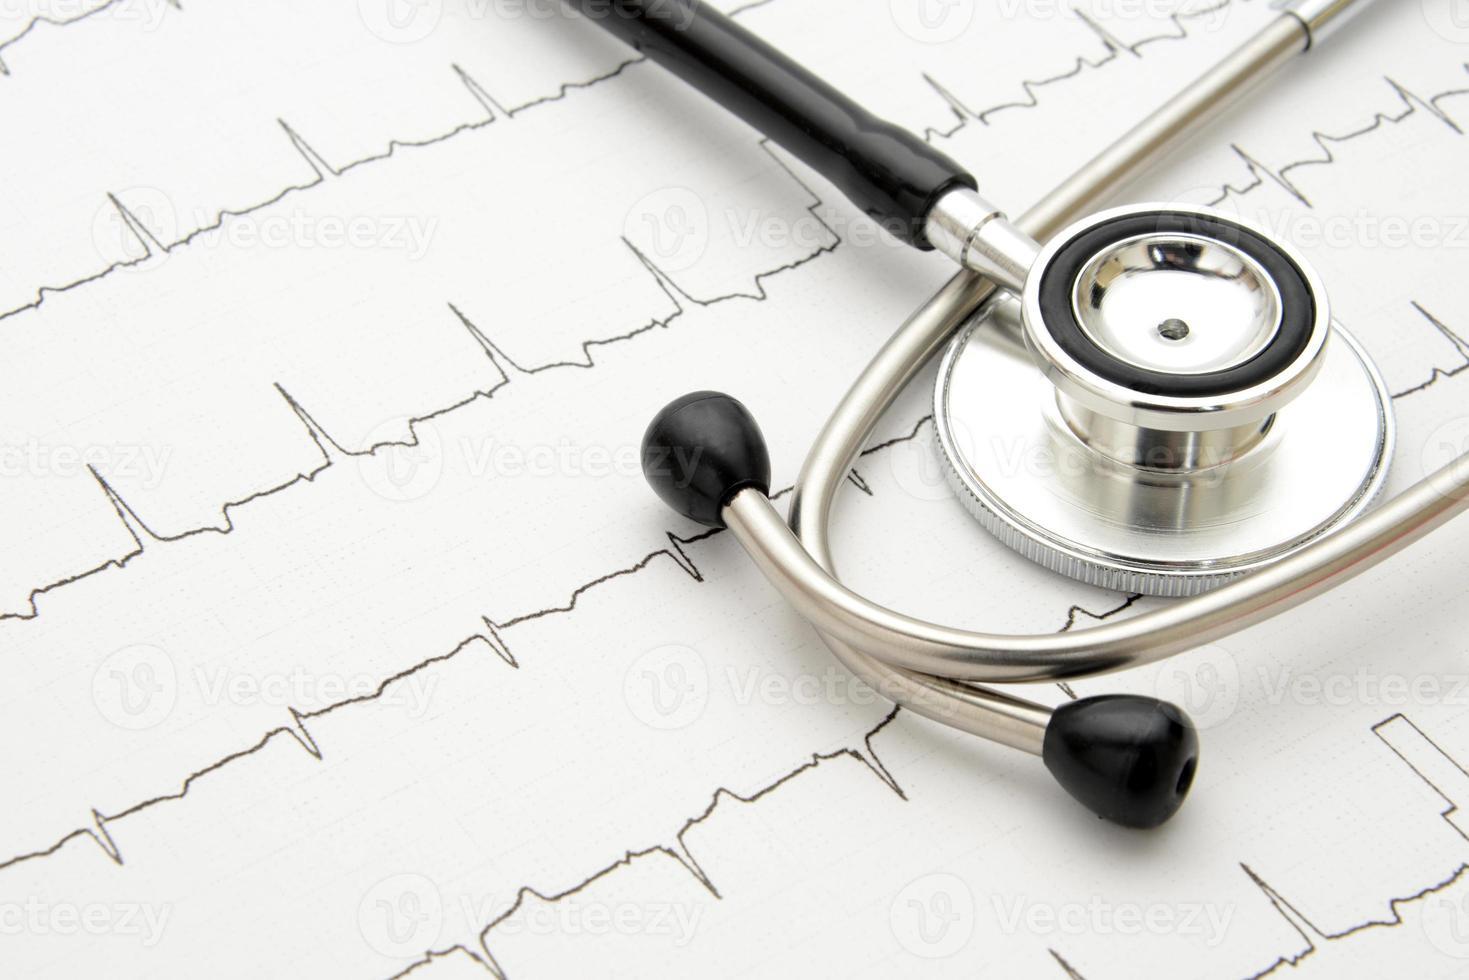 stetoskop på elektrokardiogram foto